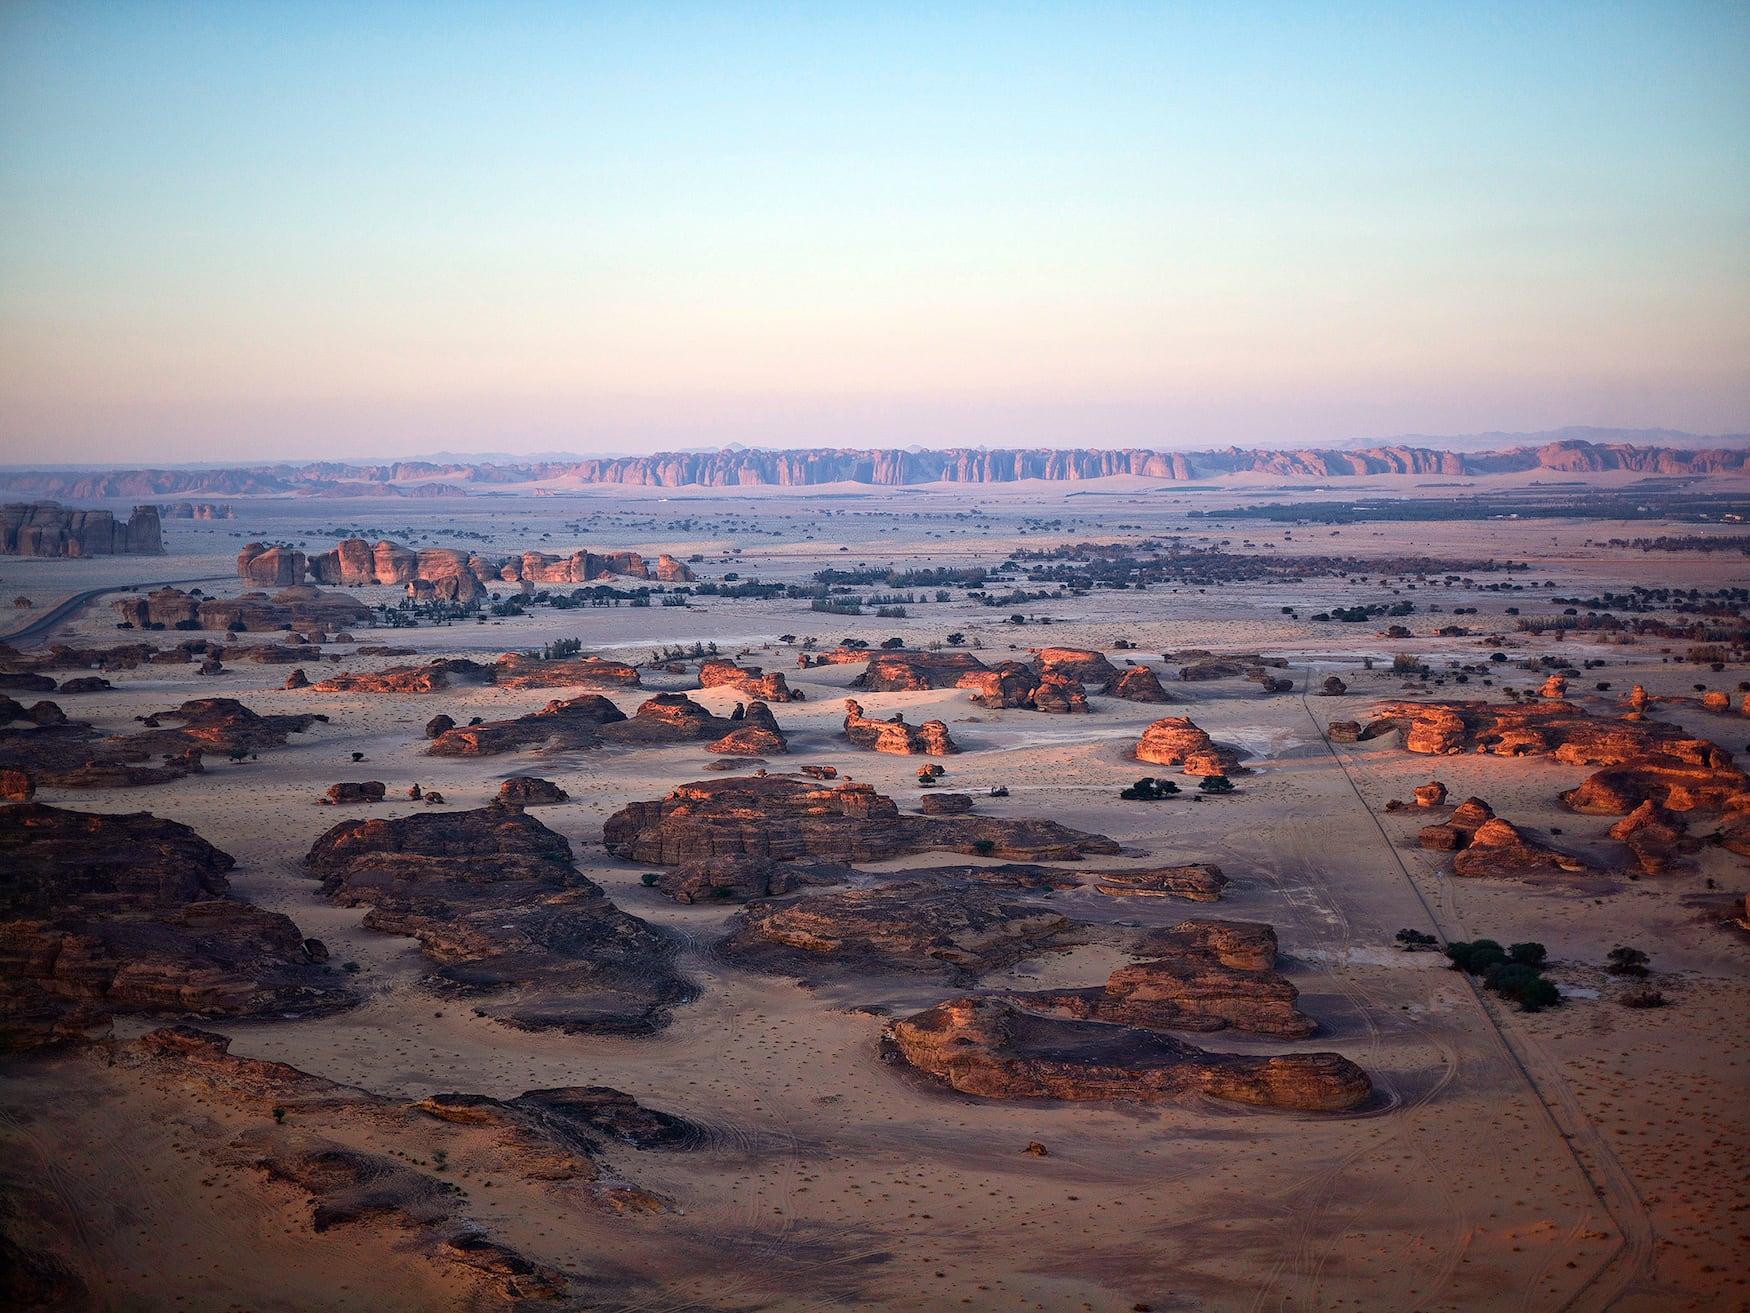 Panorama Wüste Saudi Arabien